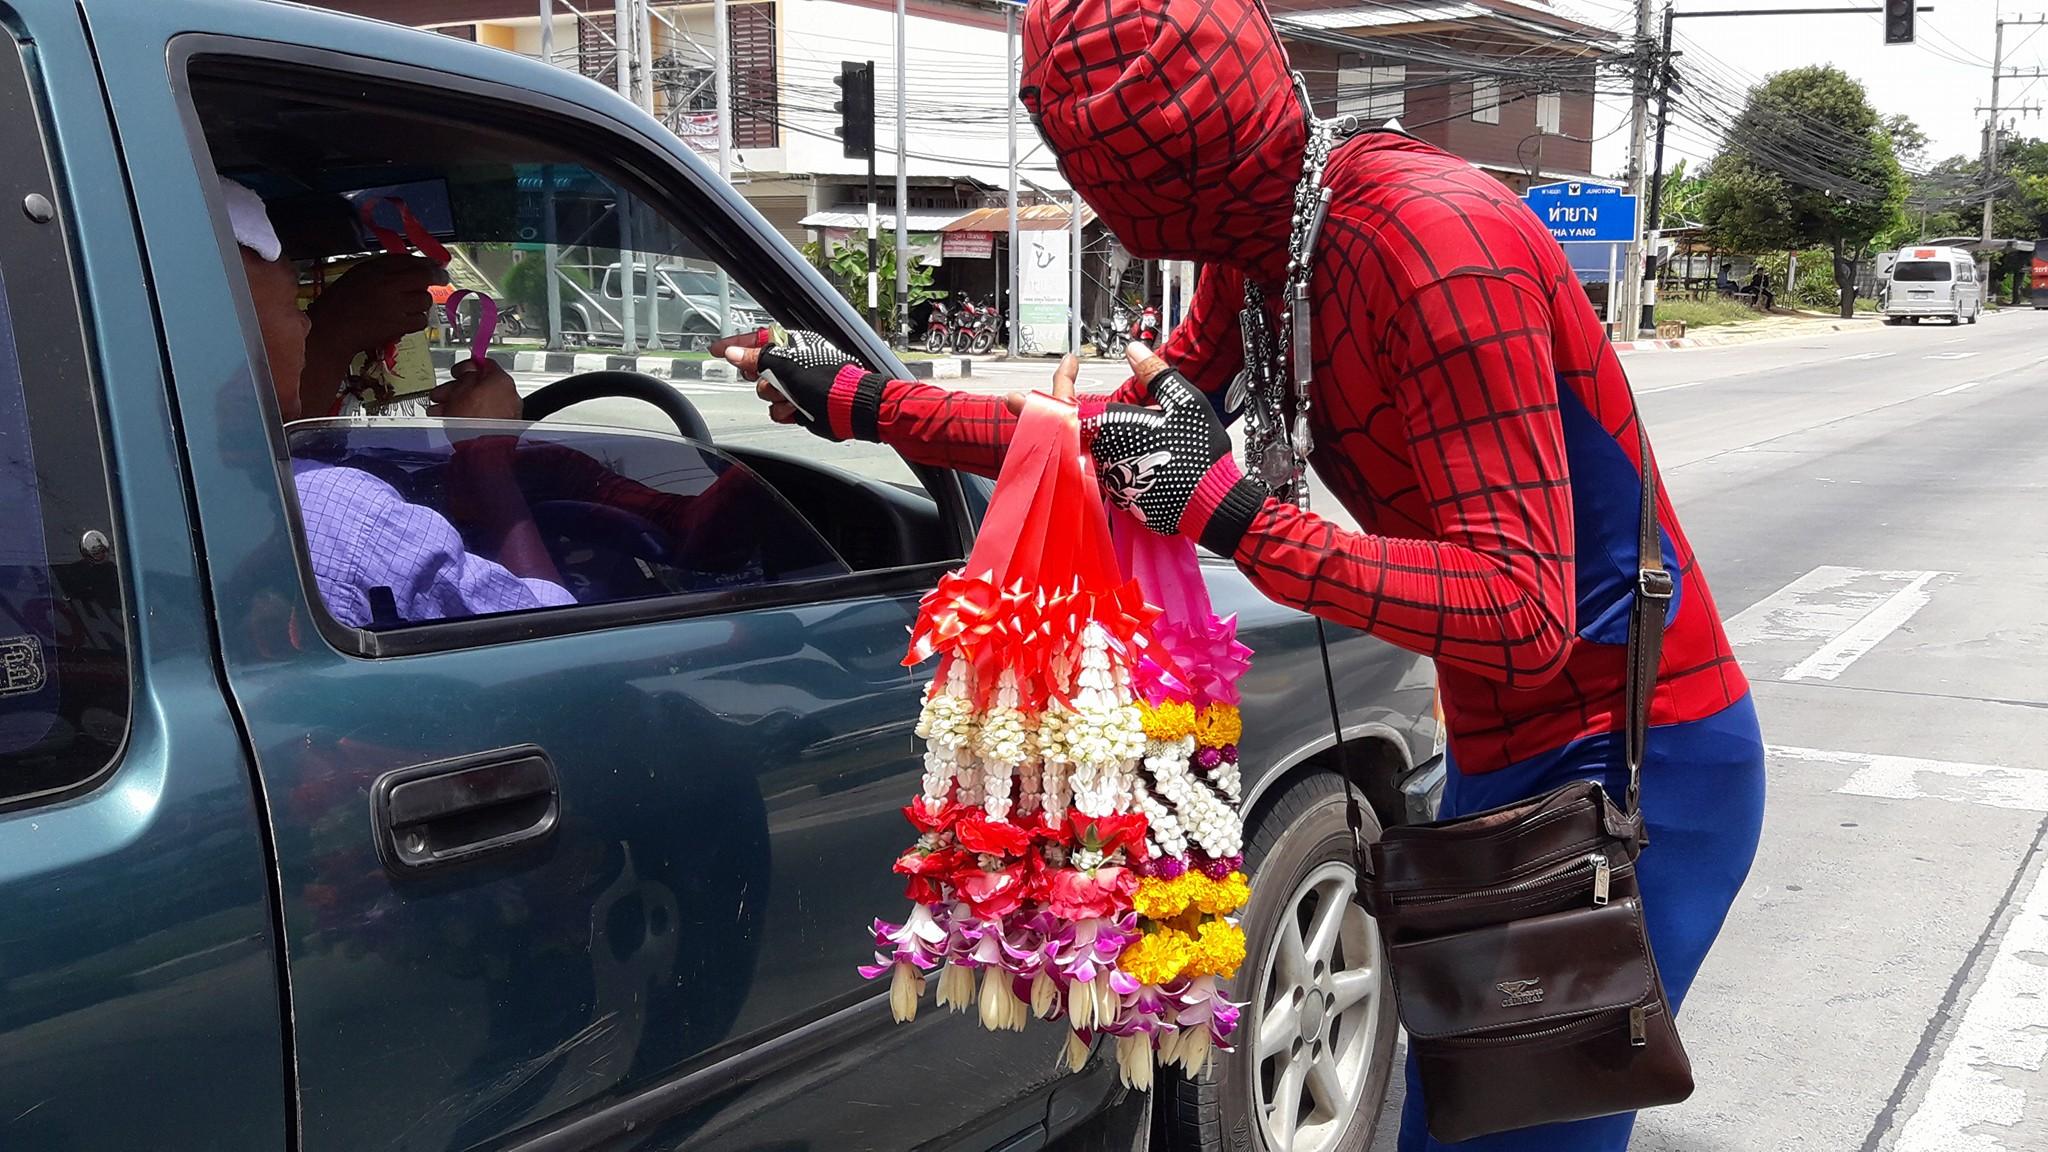 花売りスパイダーマン ©นี่เเหละ.ตัวตน คนเขียนข่าว